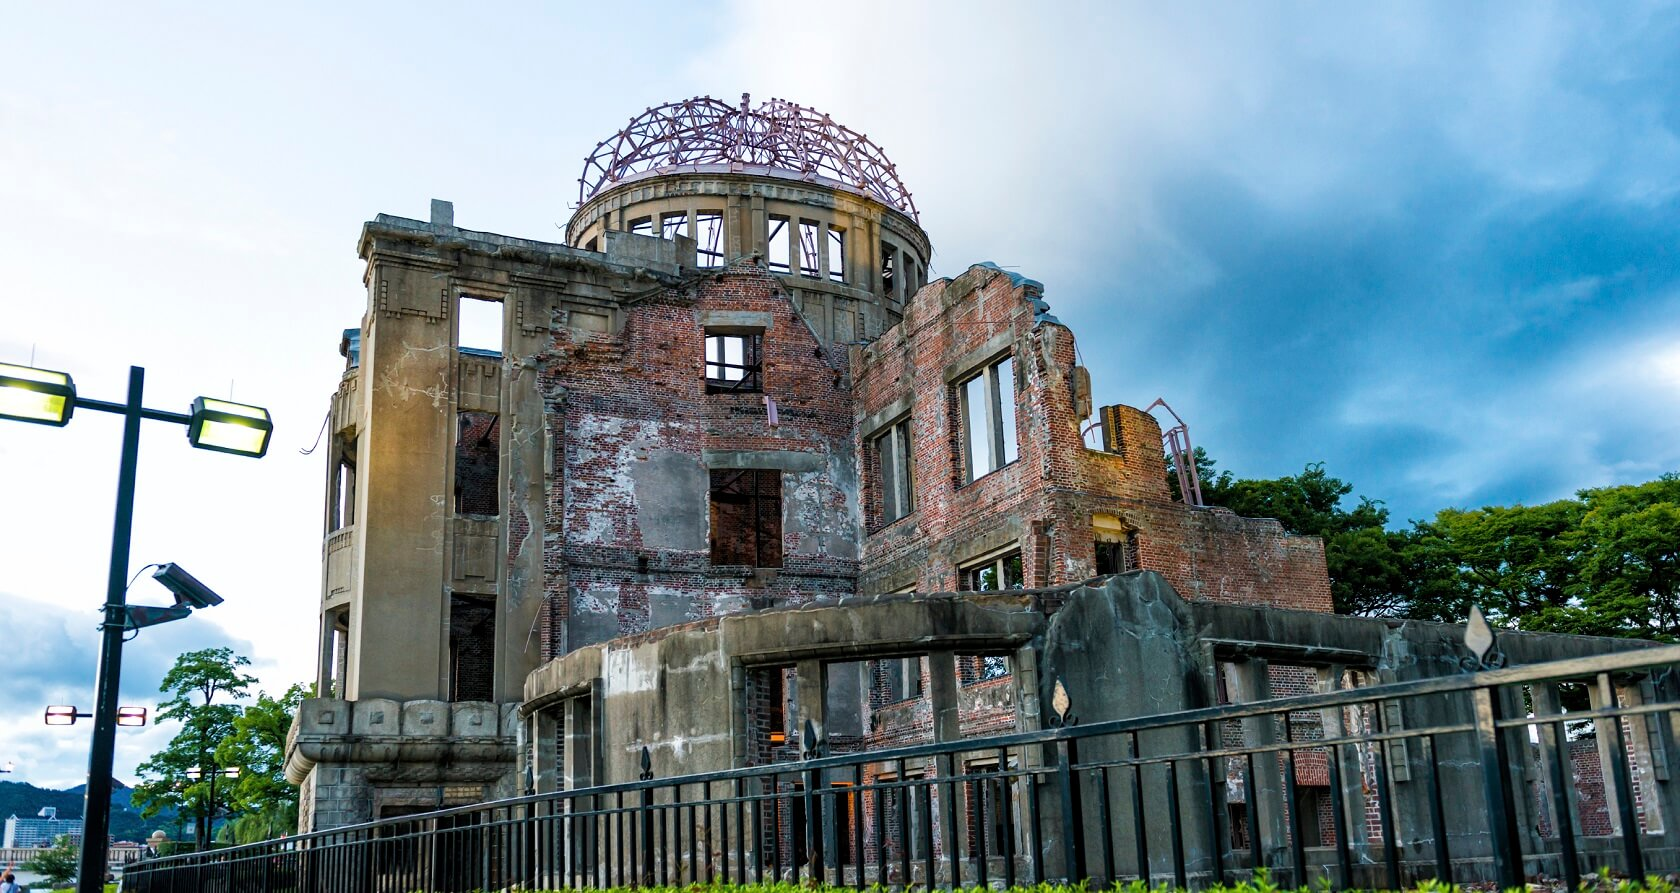 Hiroshima A-Bomb Dome Memorial